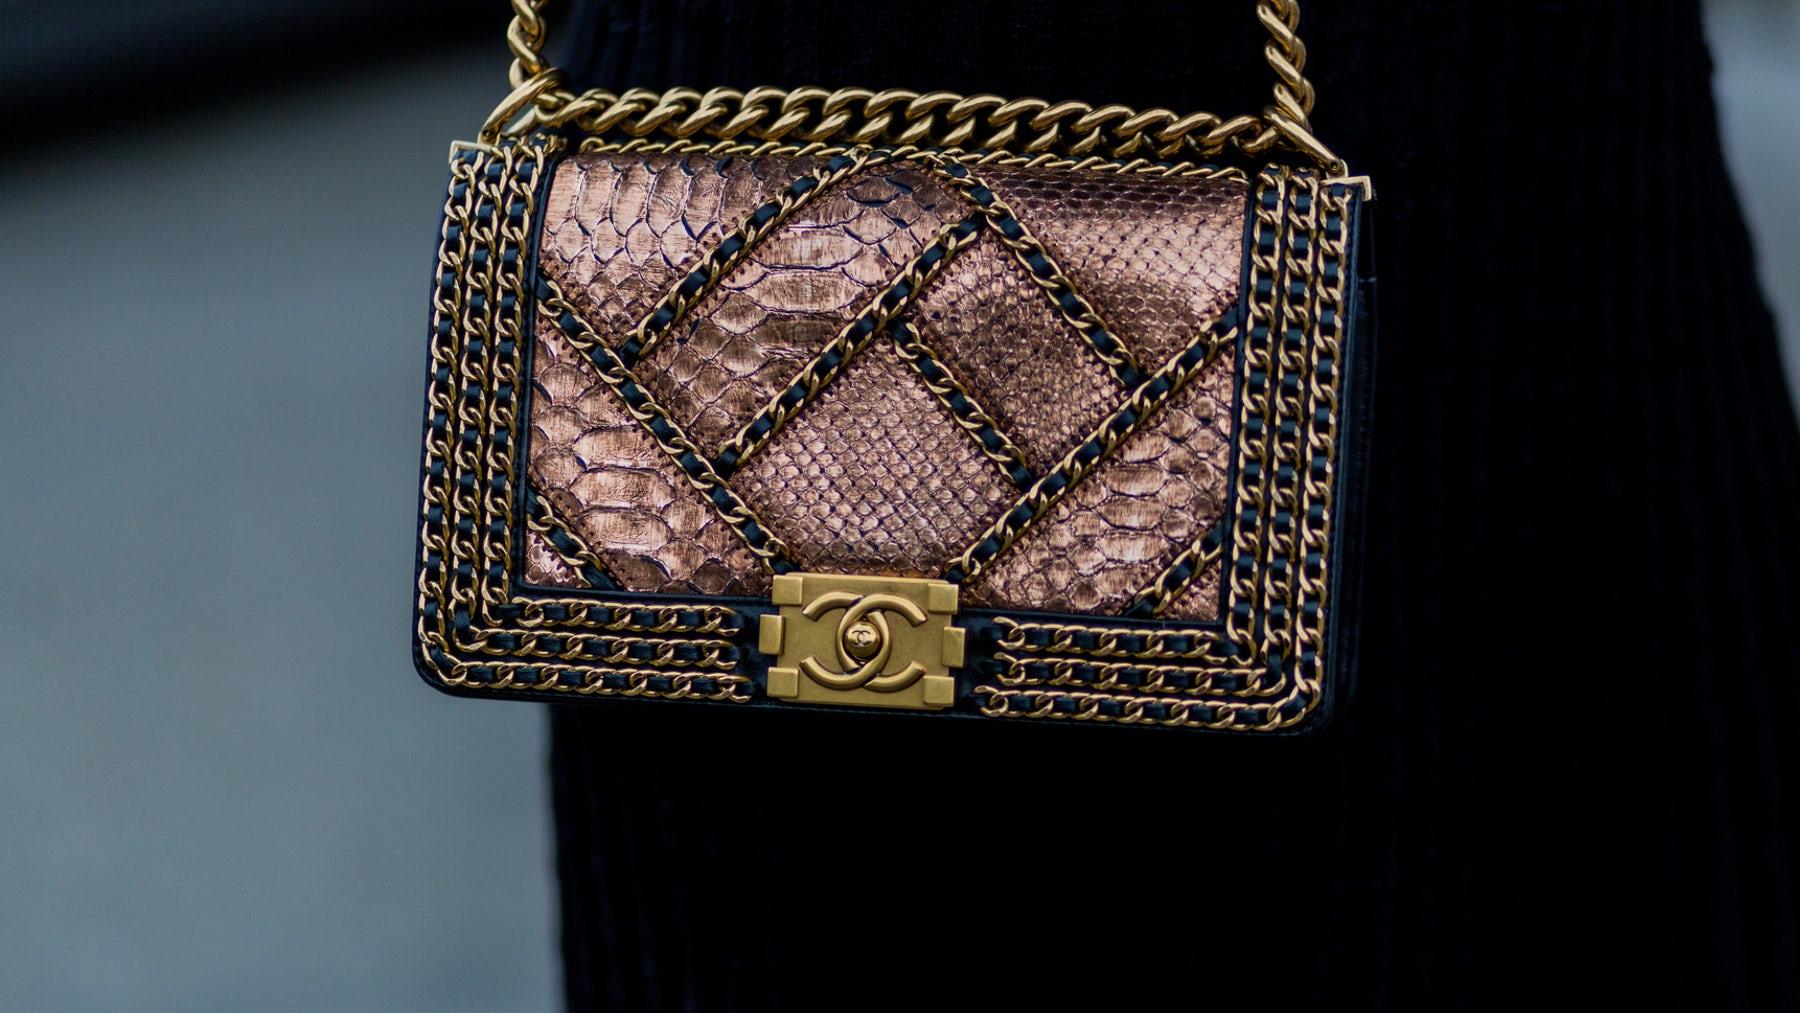 A Chanel python handbag | Source: Getty Images